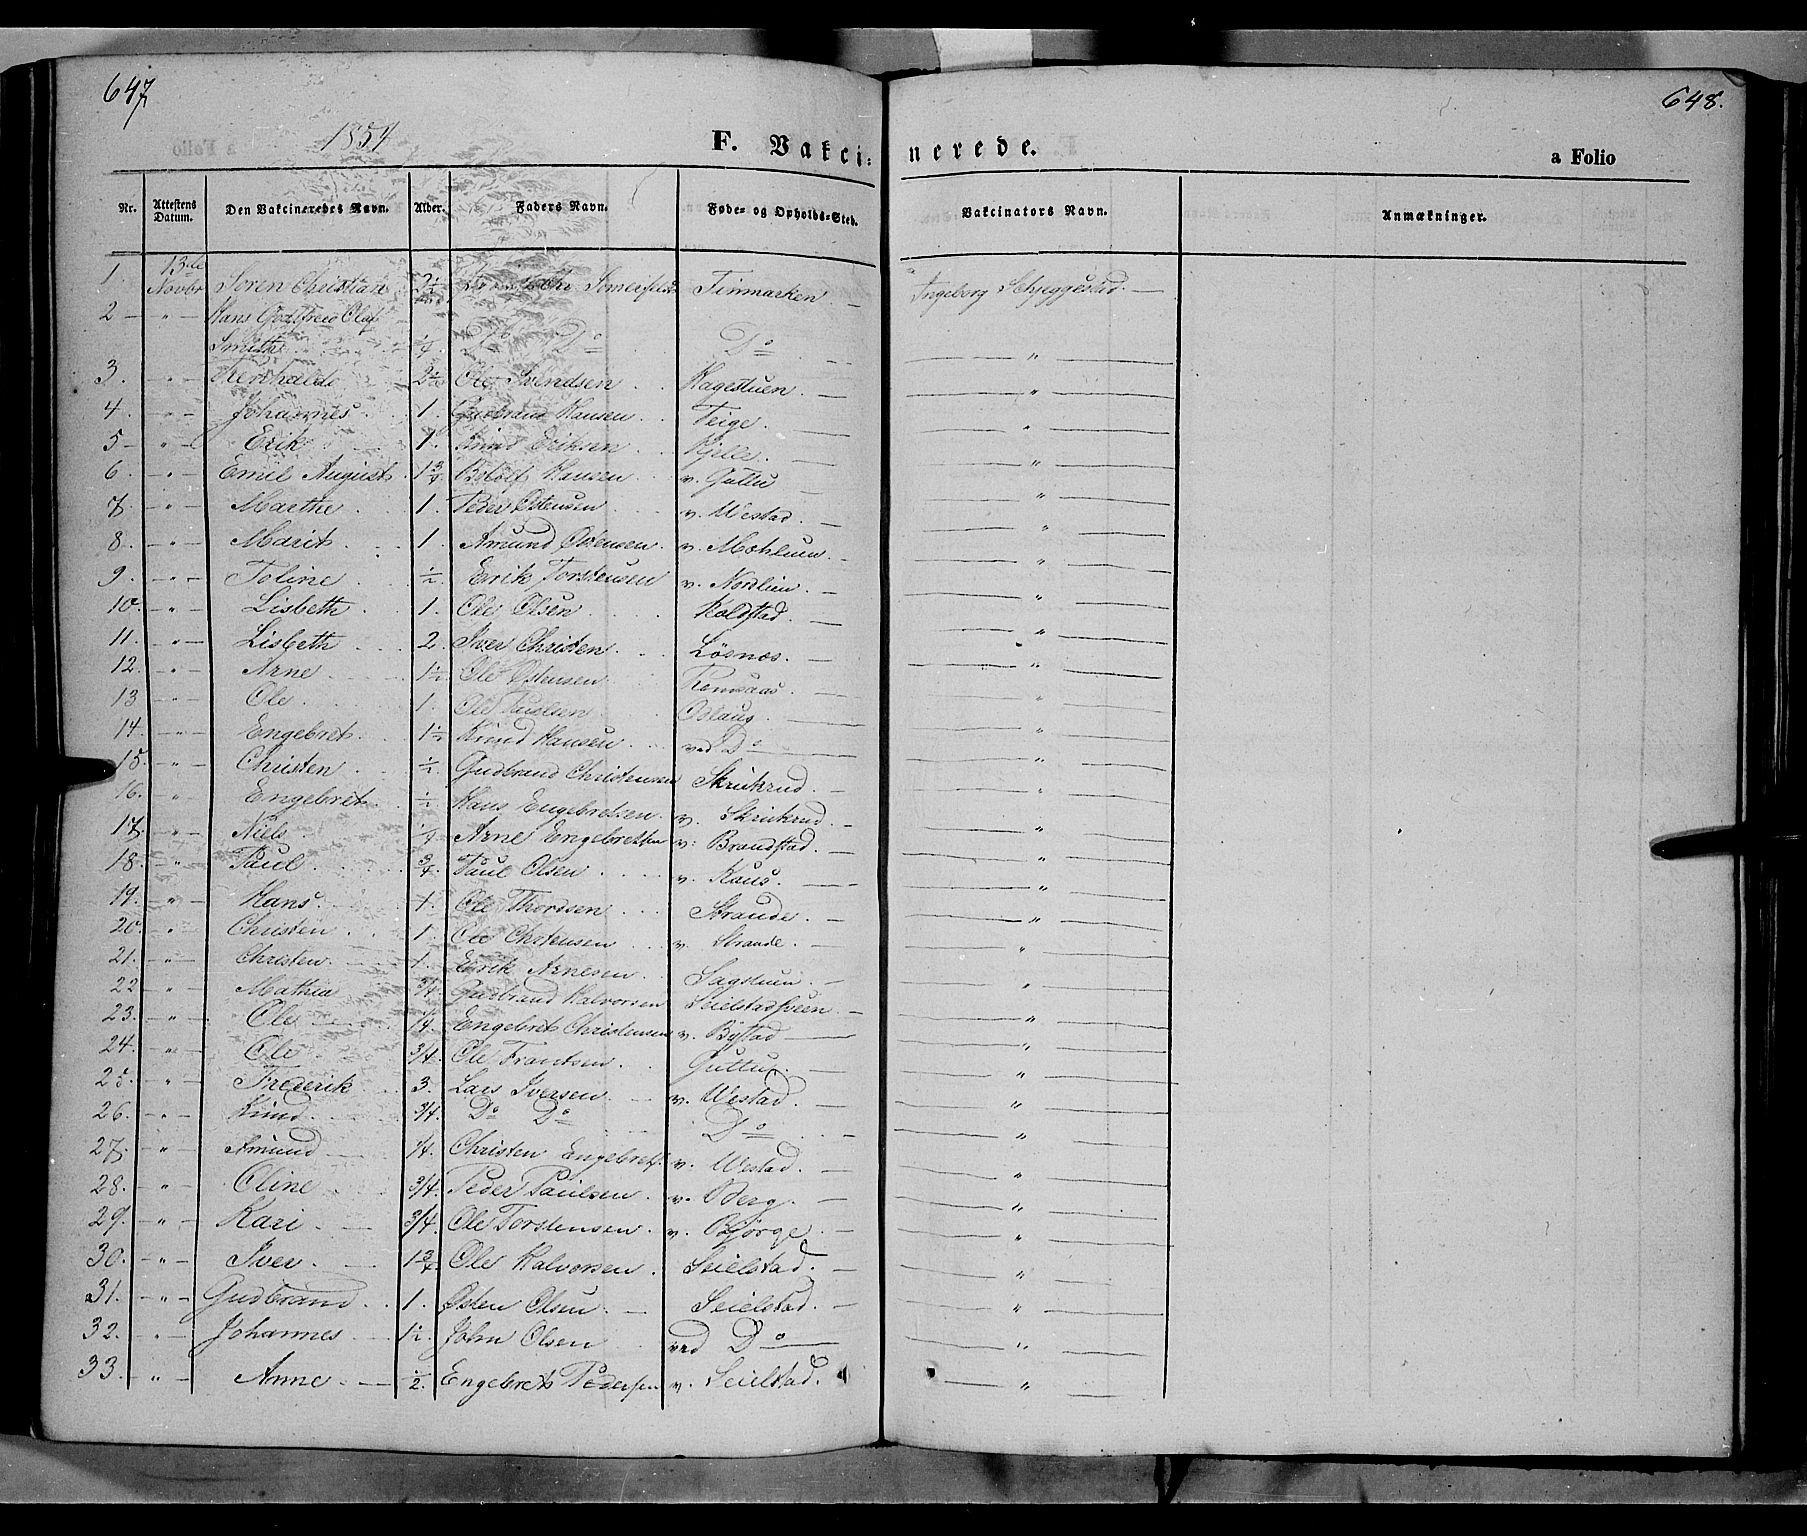 SAH, Ringebu prestekontor, Ministerialbok nr. 6, 1848-1859, s. 647-648